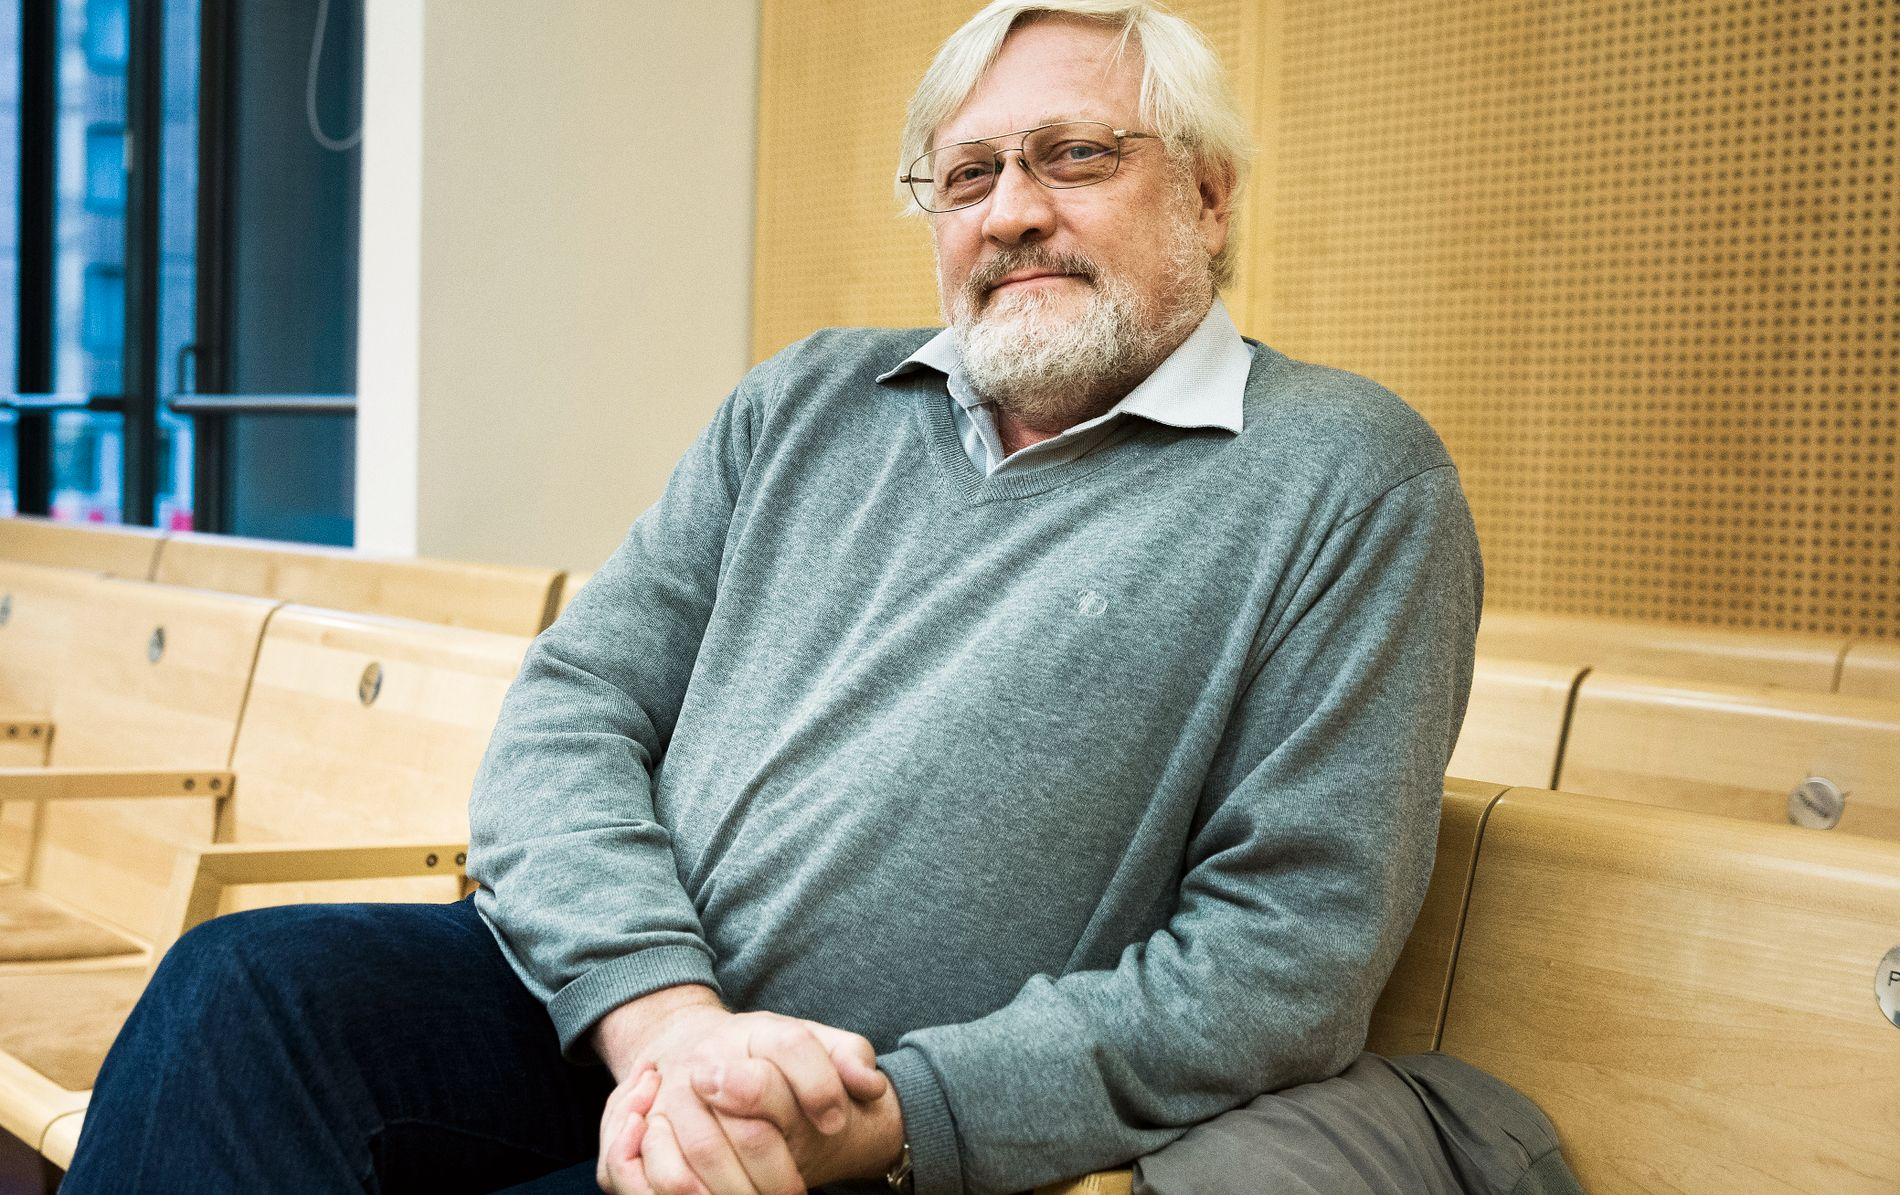 ISLAMFORSKER: Førsteamanuensis Lars Gule ved Høgskolen i Oslo og Akershus (HiOA).